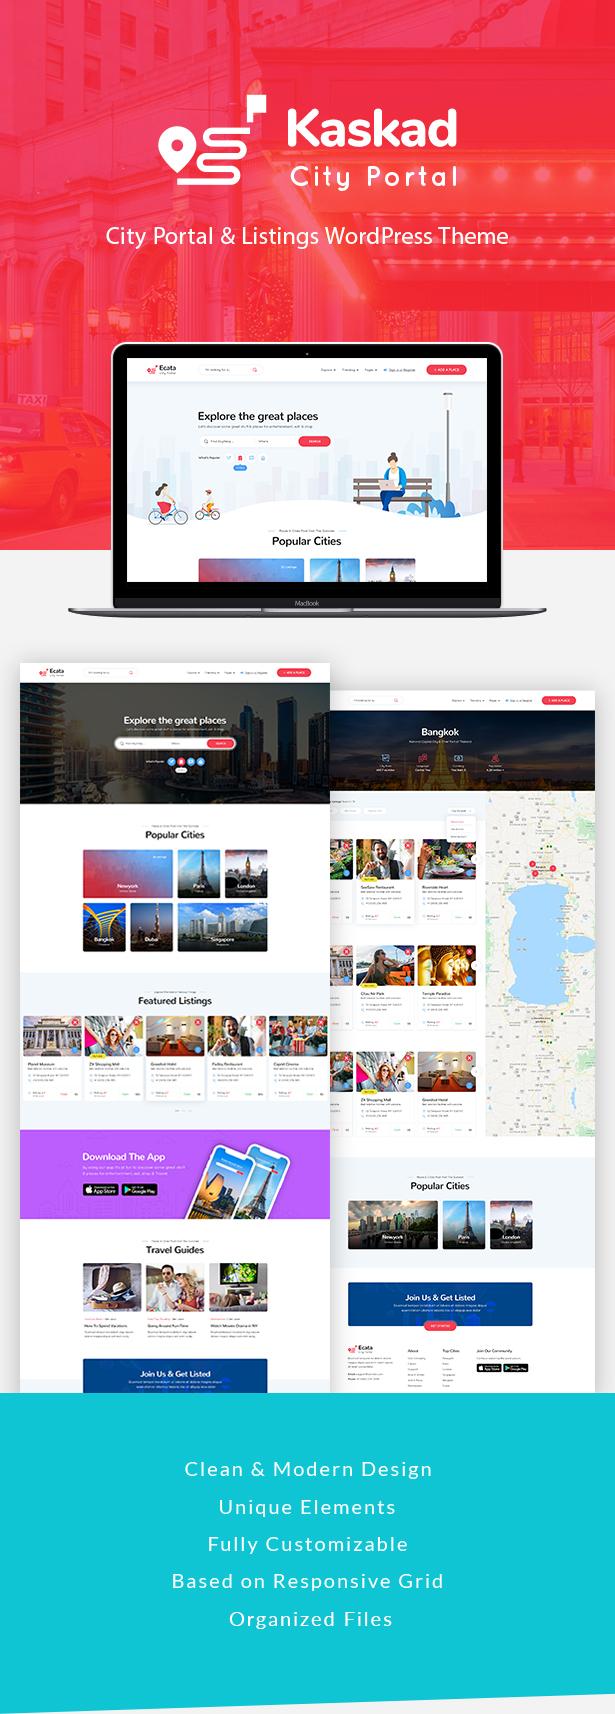 Kaskad - City Guide WordPress Theme - 5